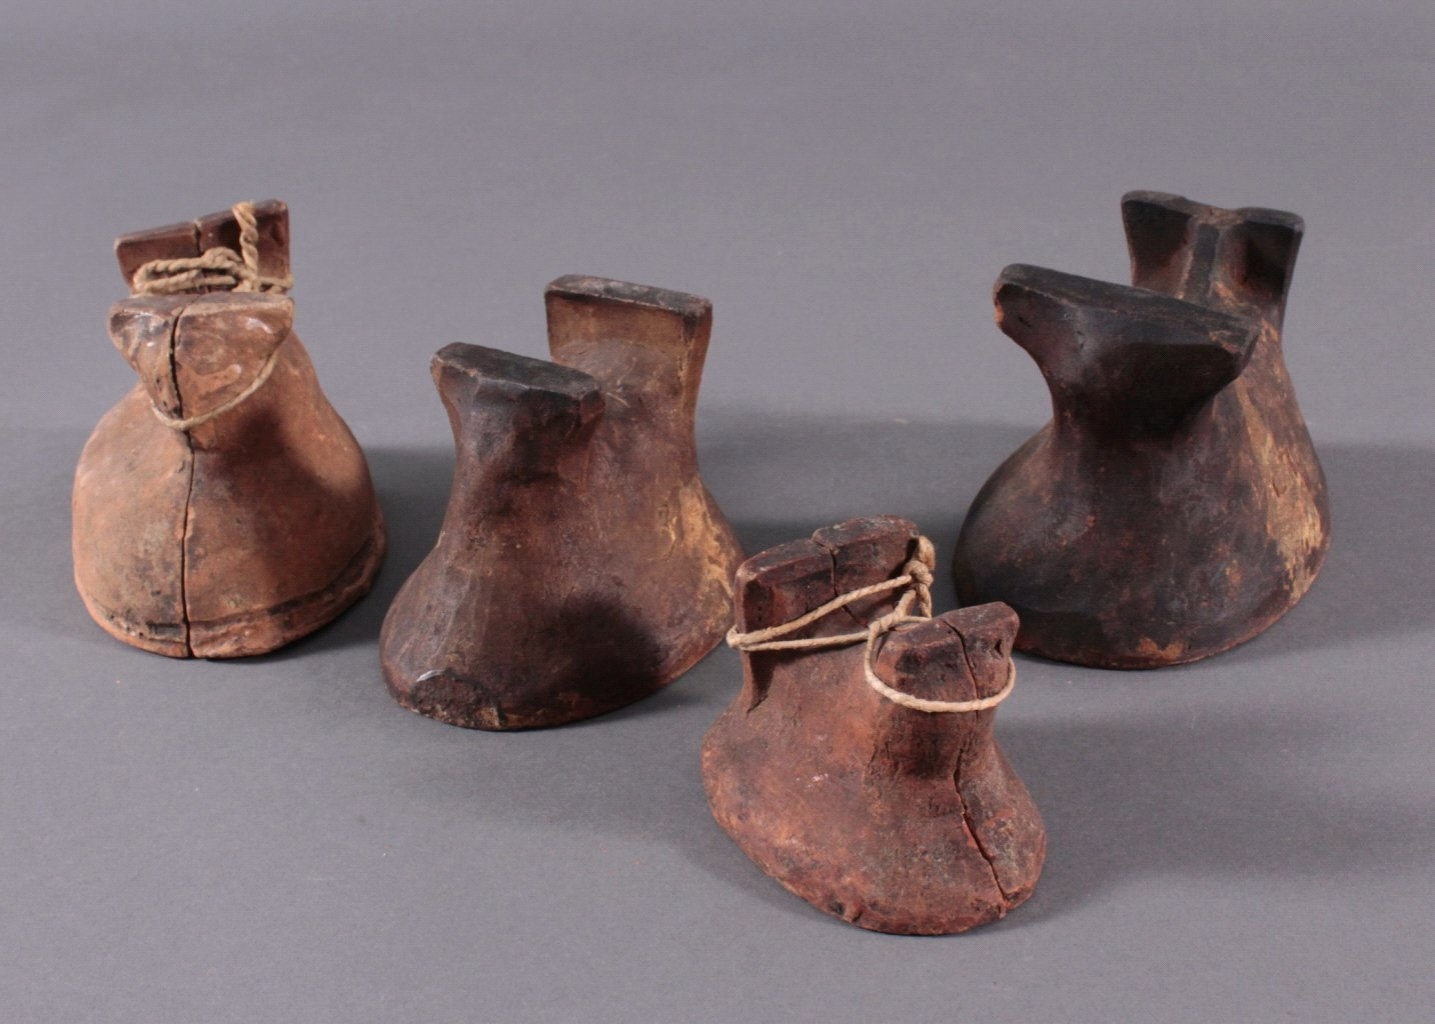 4 Osterlamm-Backformen aus Keramik um 1900